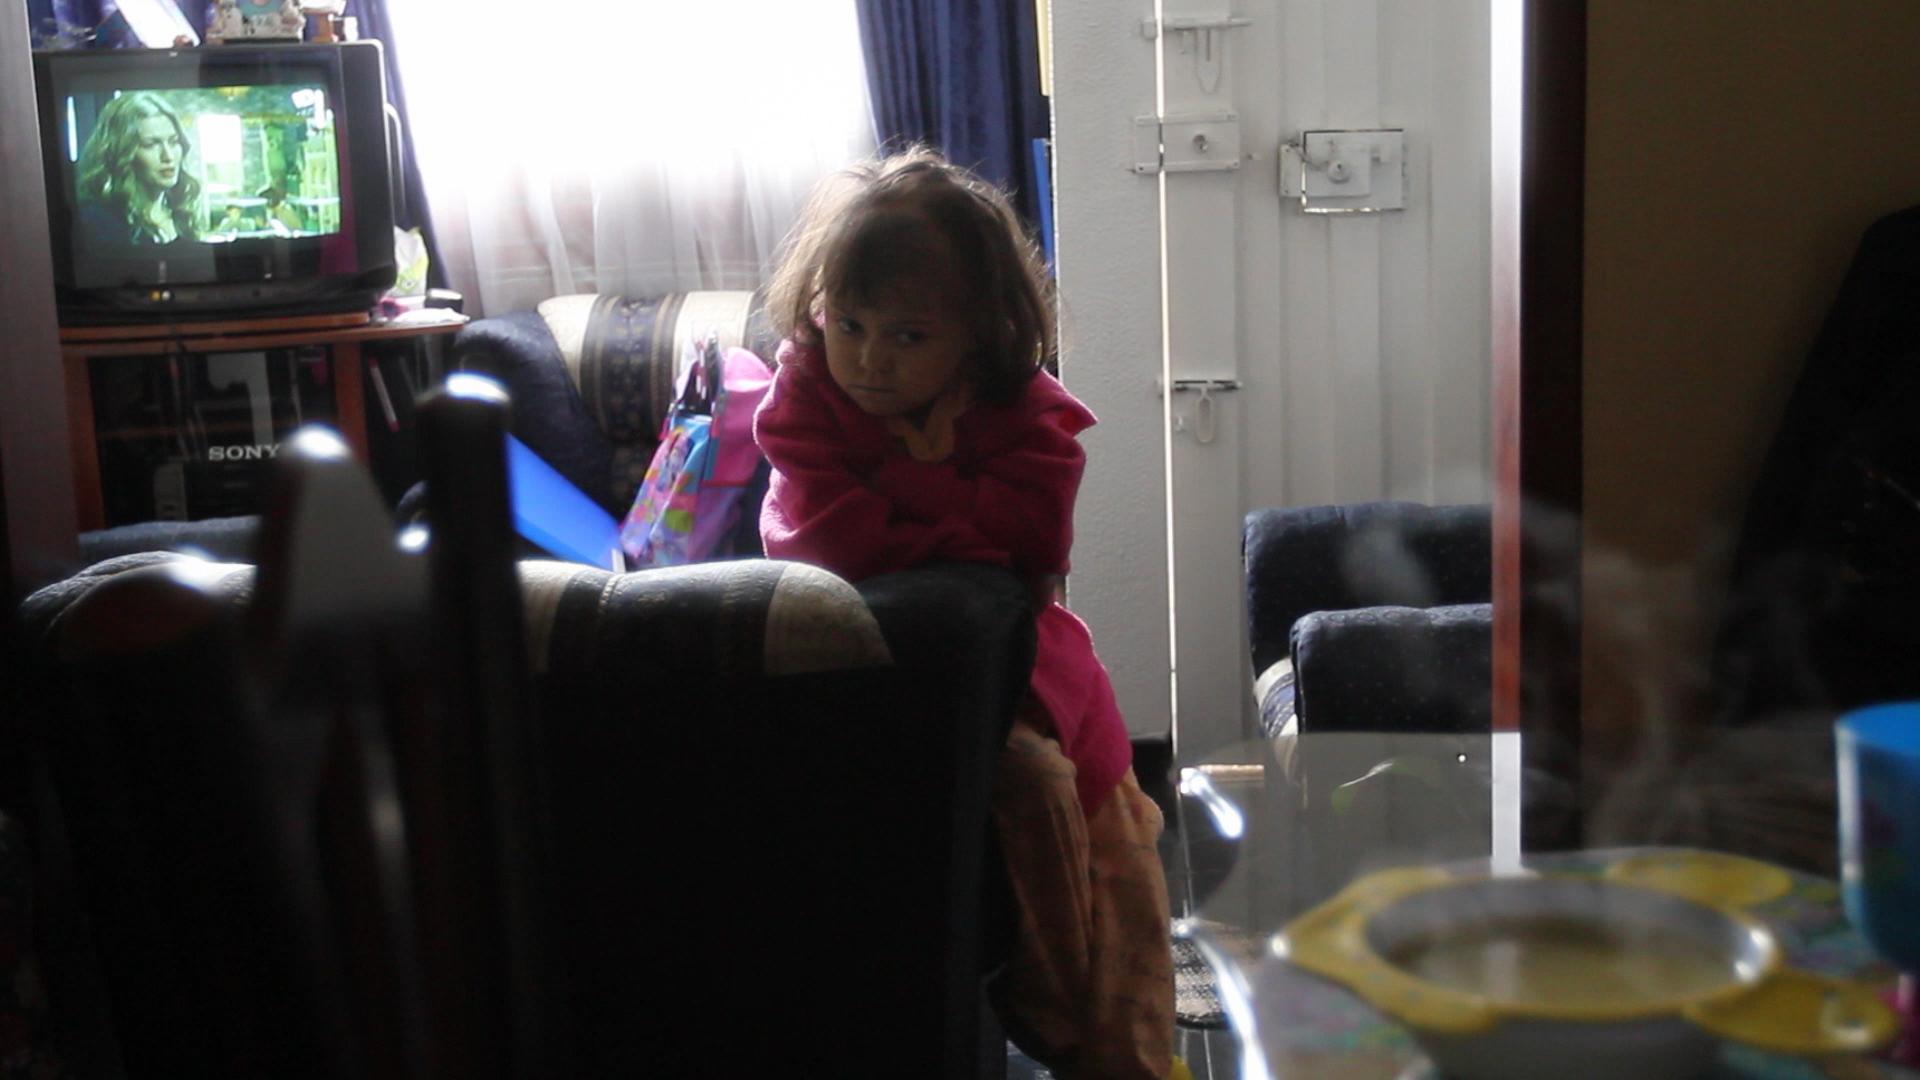 tv in morning0.jpg